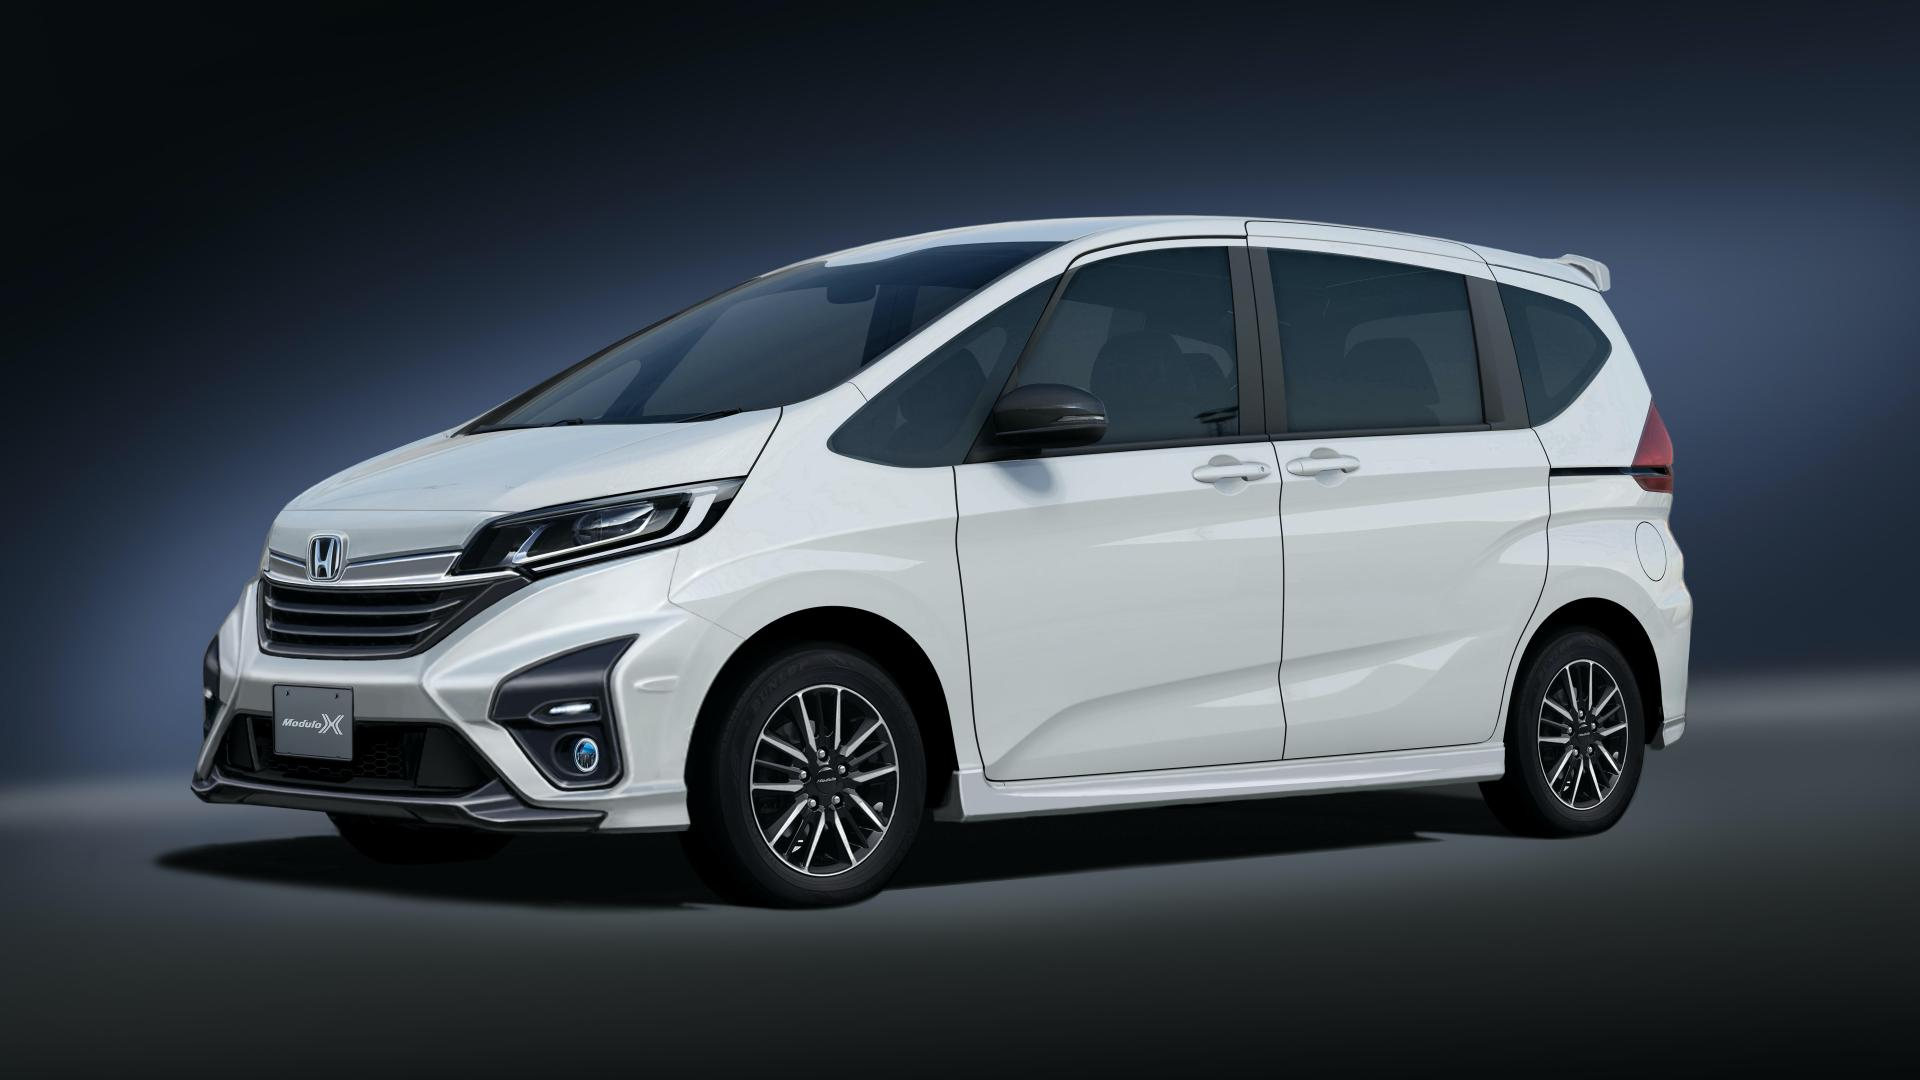 Honda-Freed-Modulo-X-Concept-1